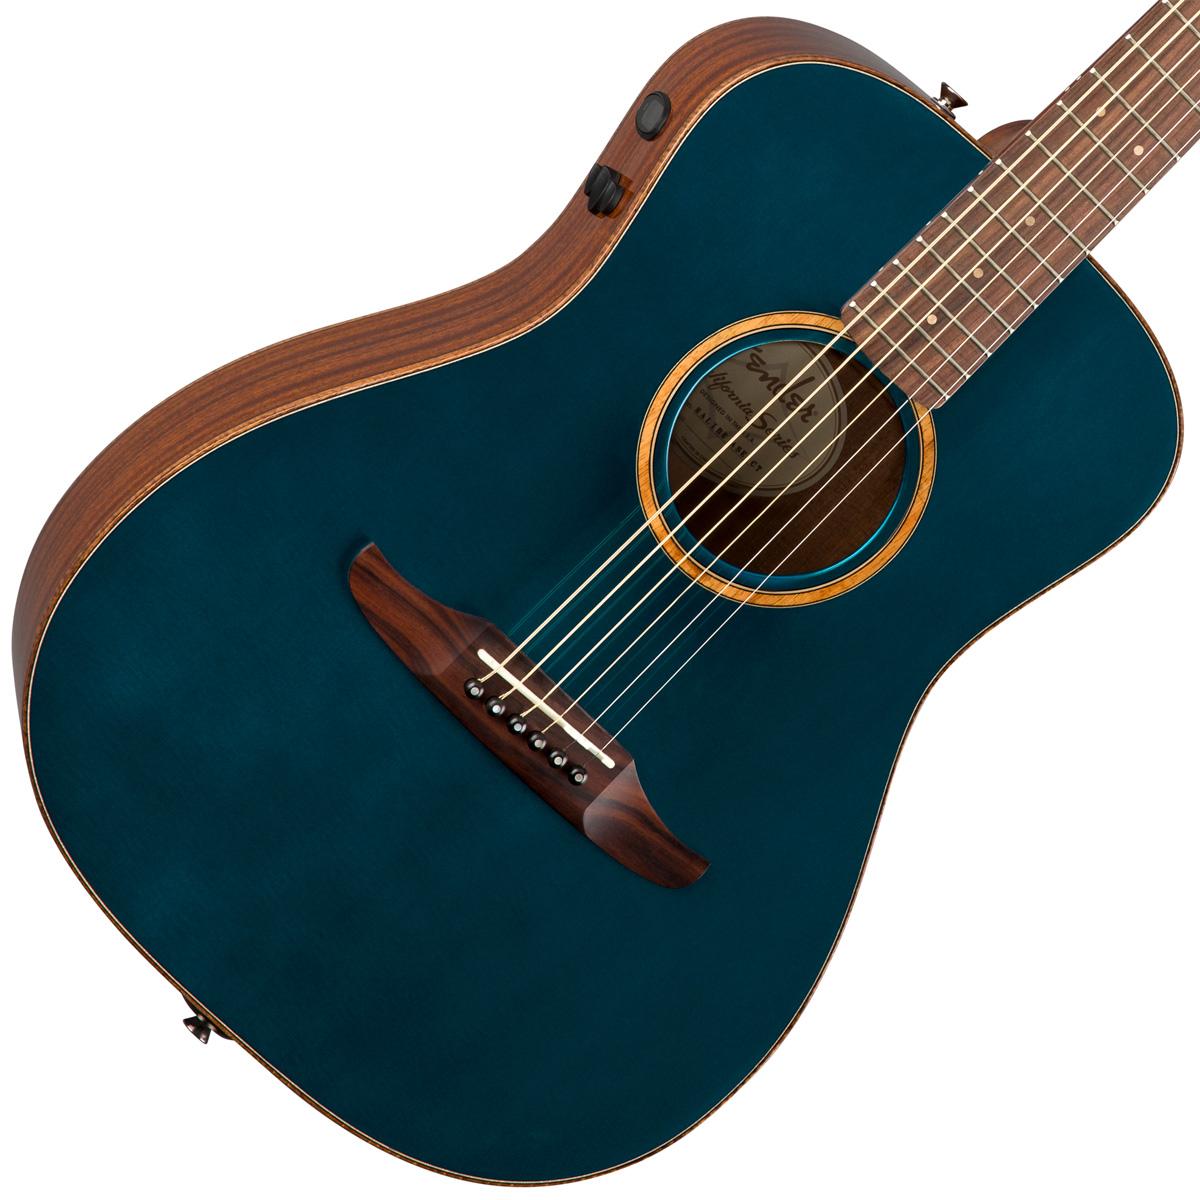 FENDER / MALIBU CLASSIC COSMIC TURQUOISE (CST) 【CALIFORNIA SERIES】フェンダー アコースティックギター【YRK】